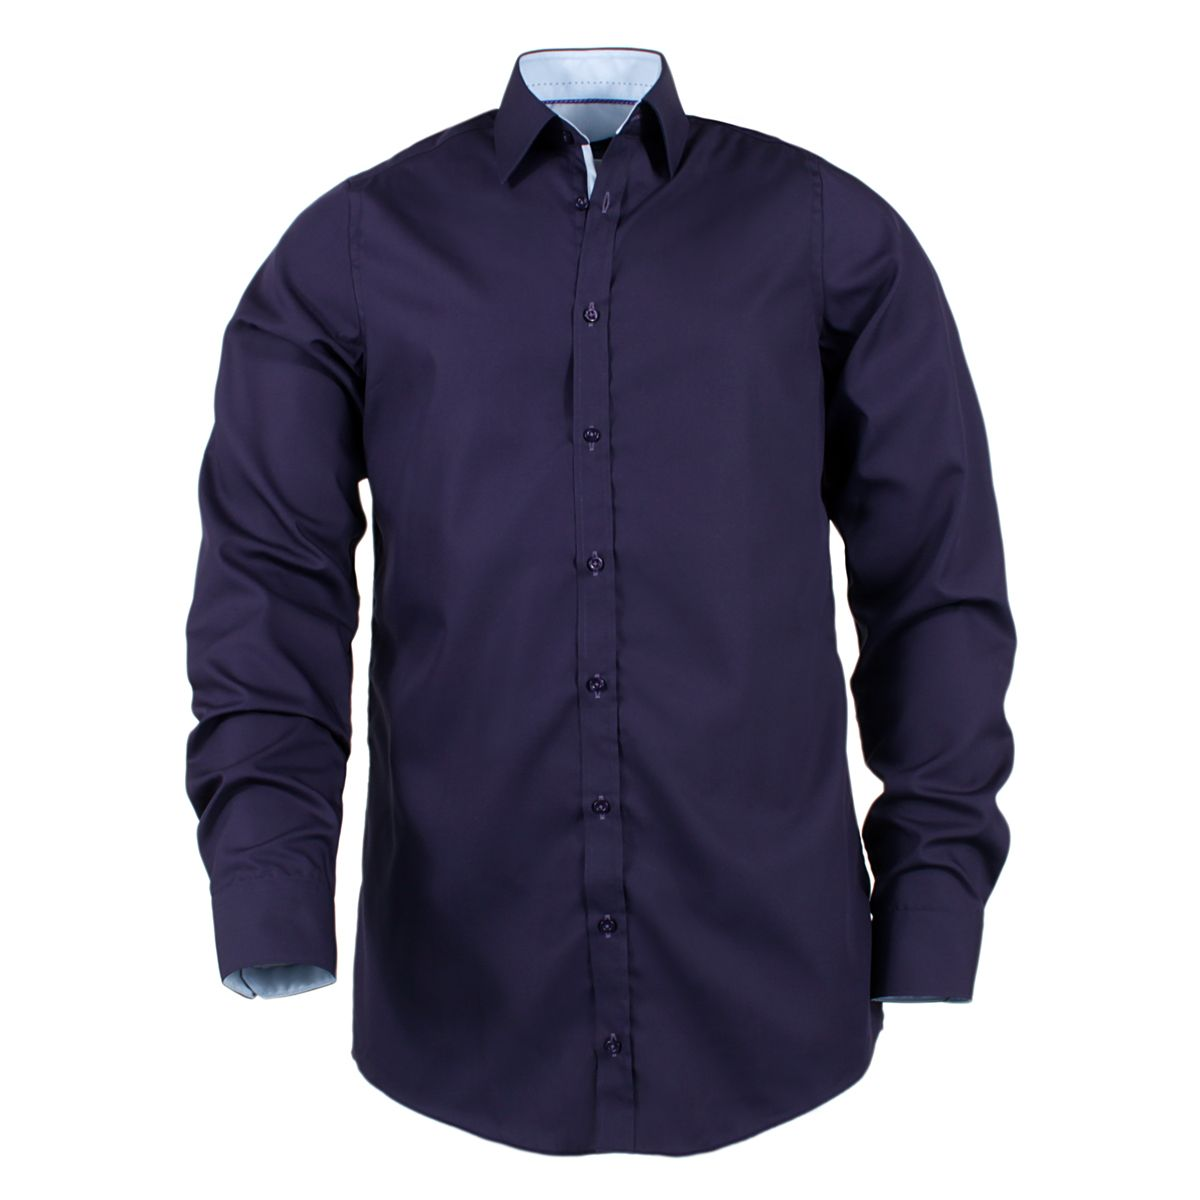 chemise violette cintr e manches extra longues 72cm size factory venti. Black Bedroom Furniture Sets. Home Design Ideas